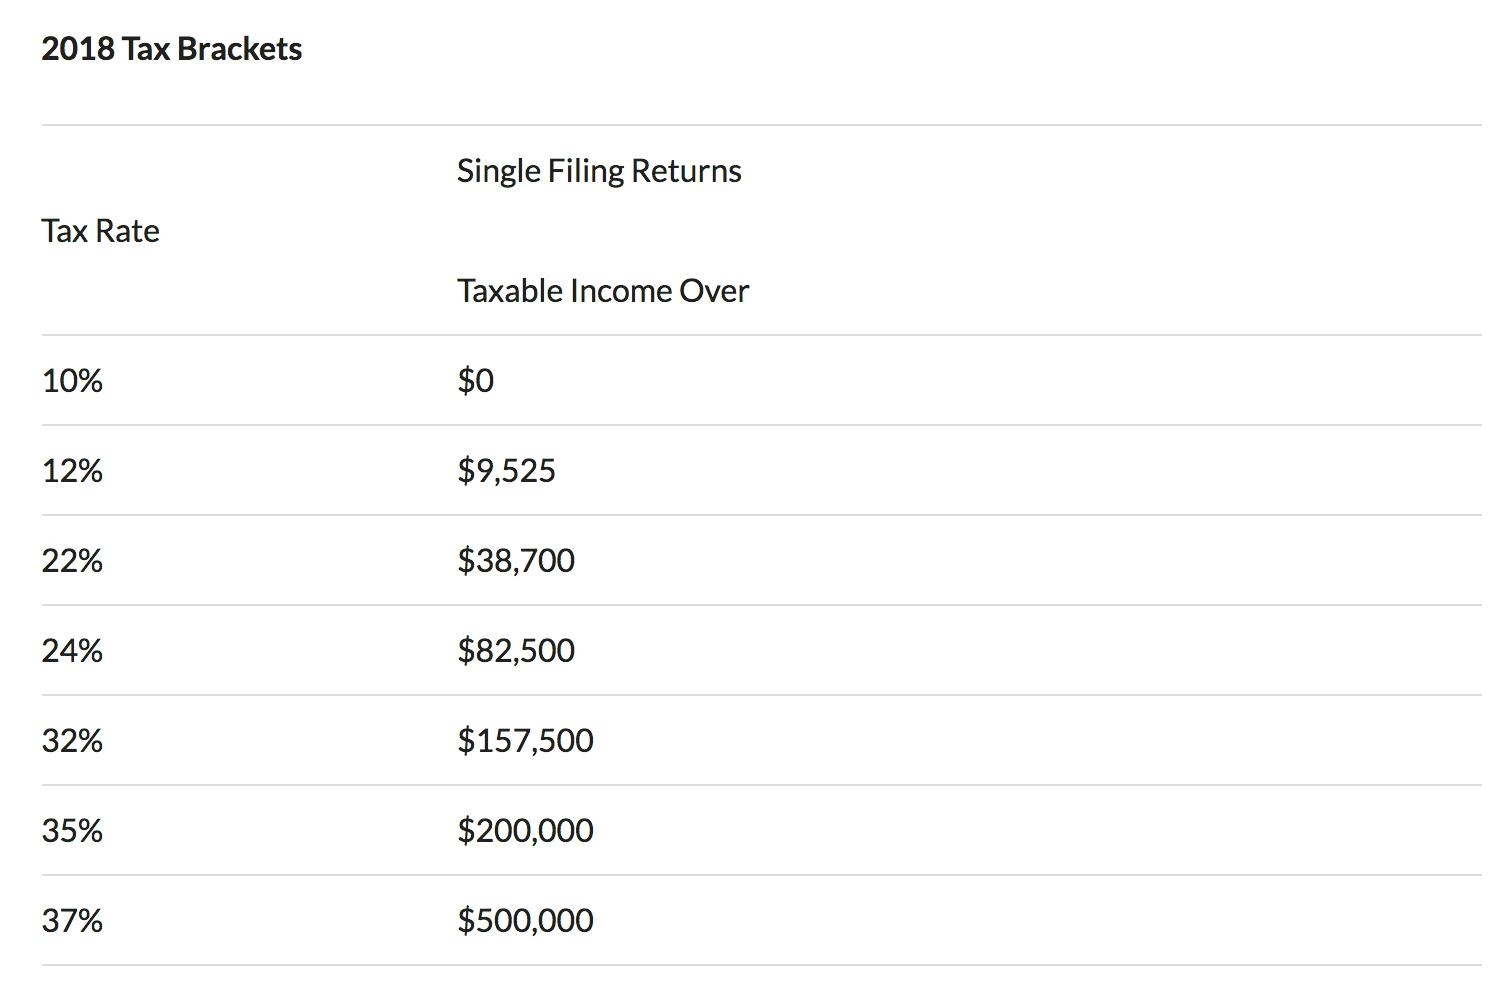 2018 single filing returns tax bracket